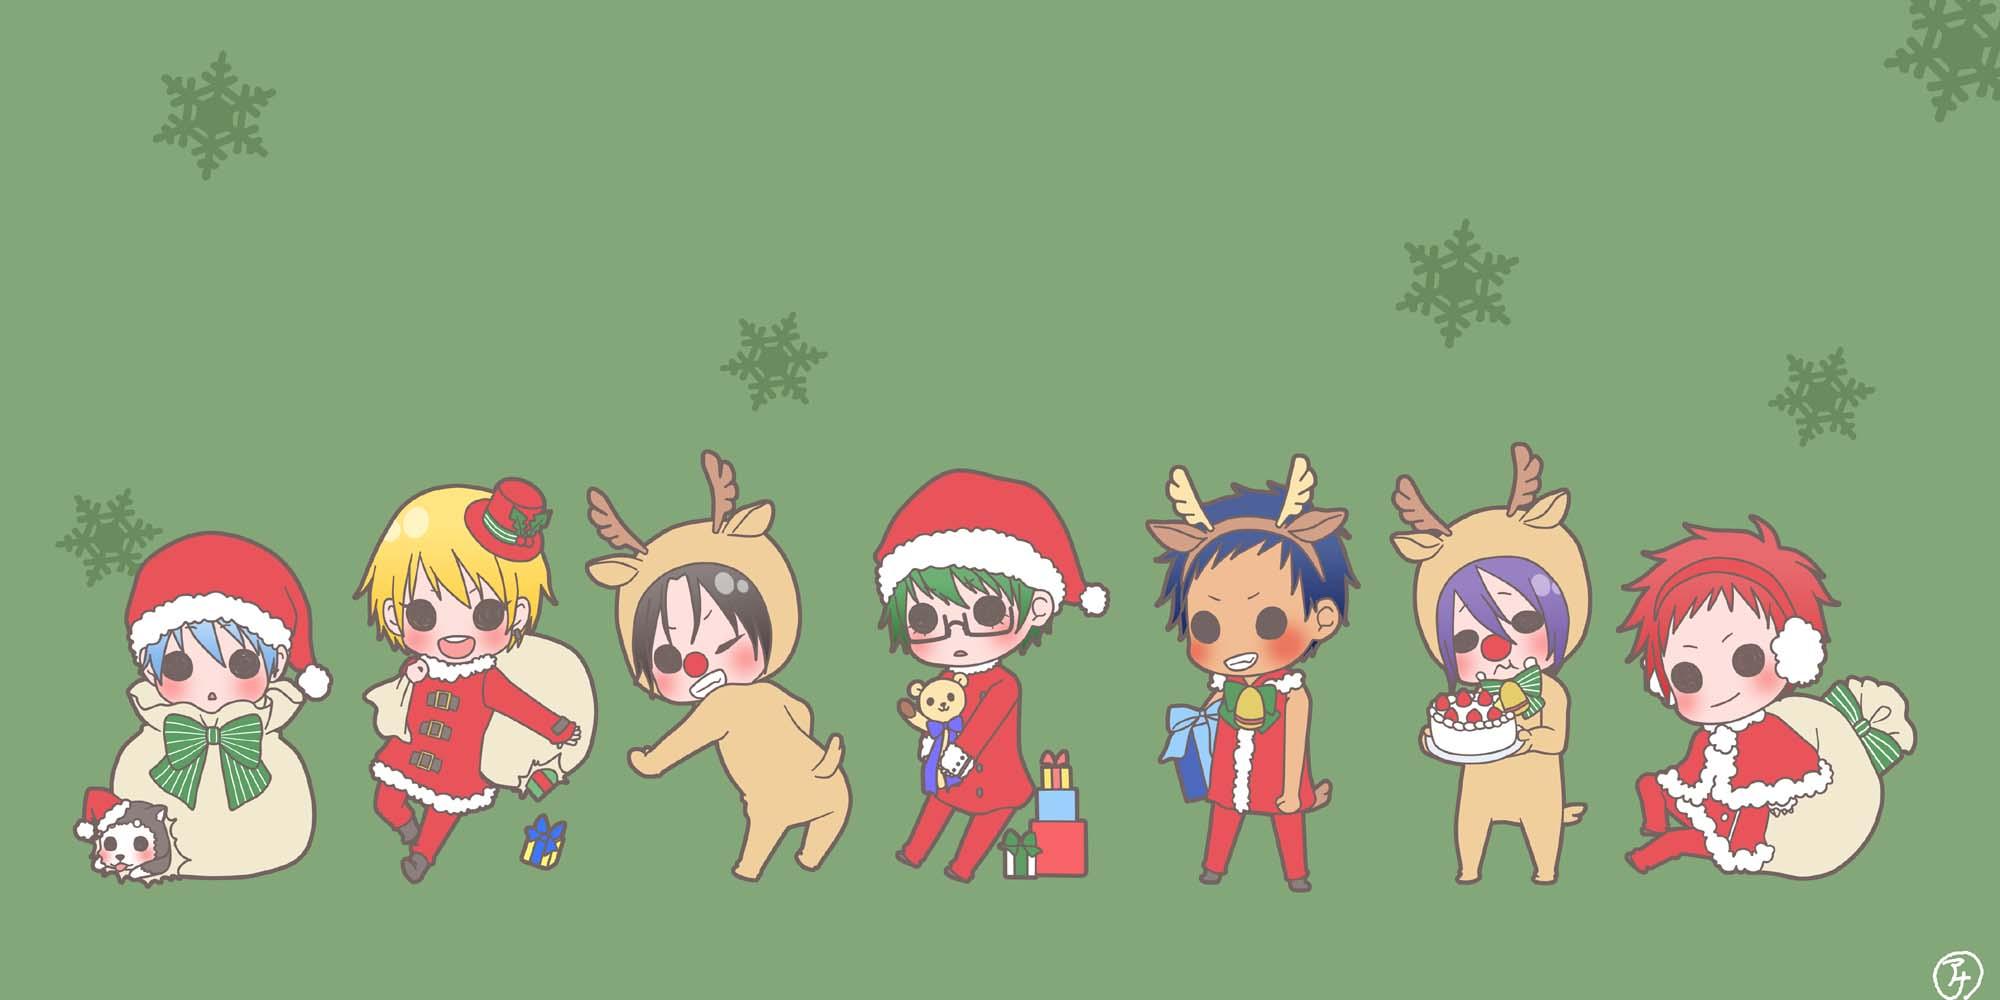 Kuroko No Basket Christmas پرستار art